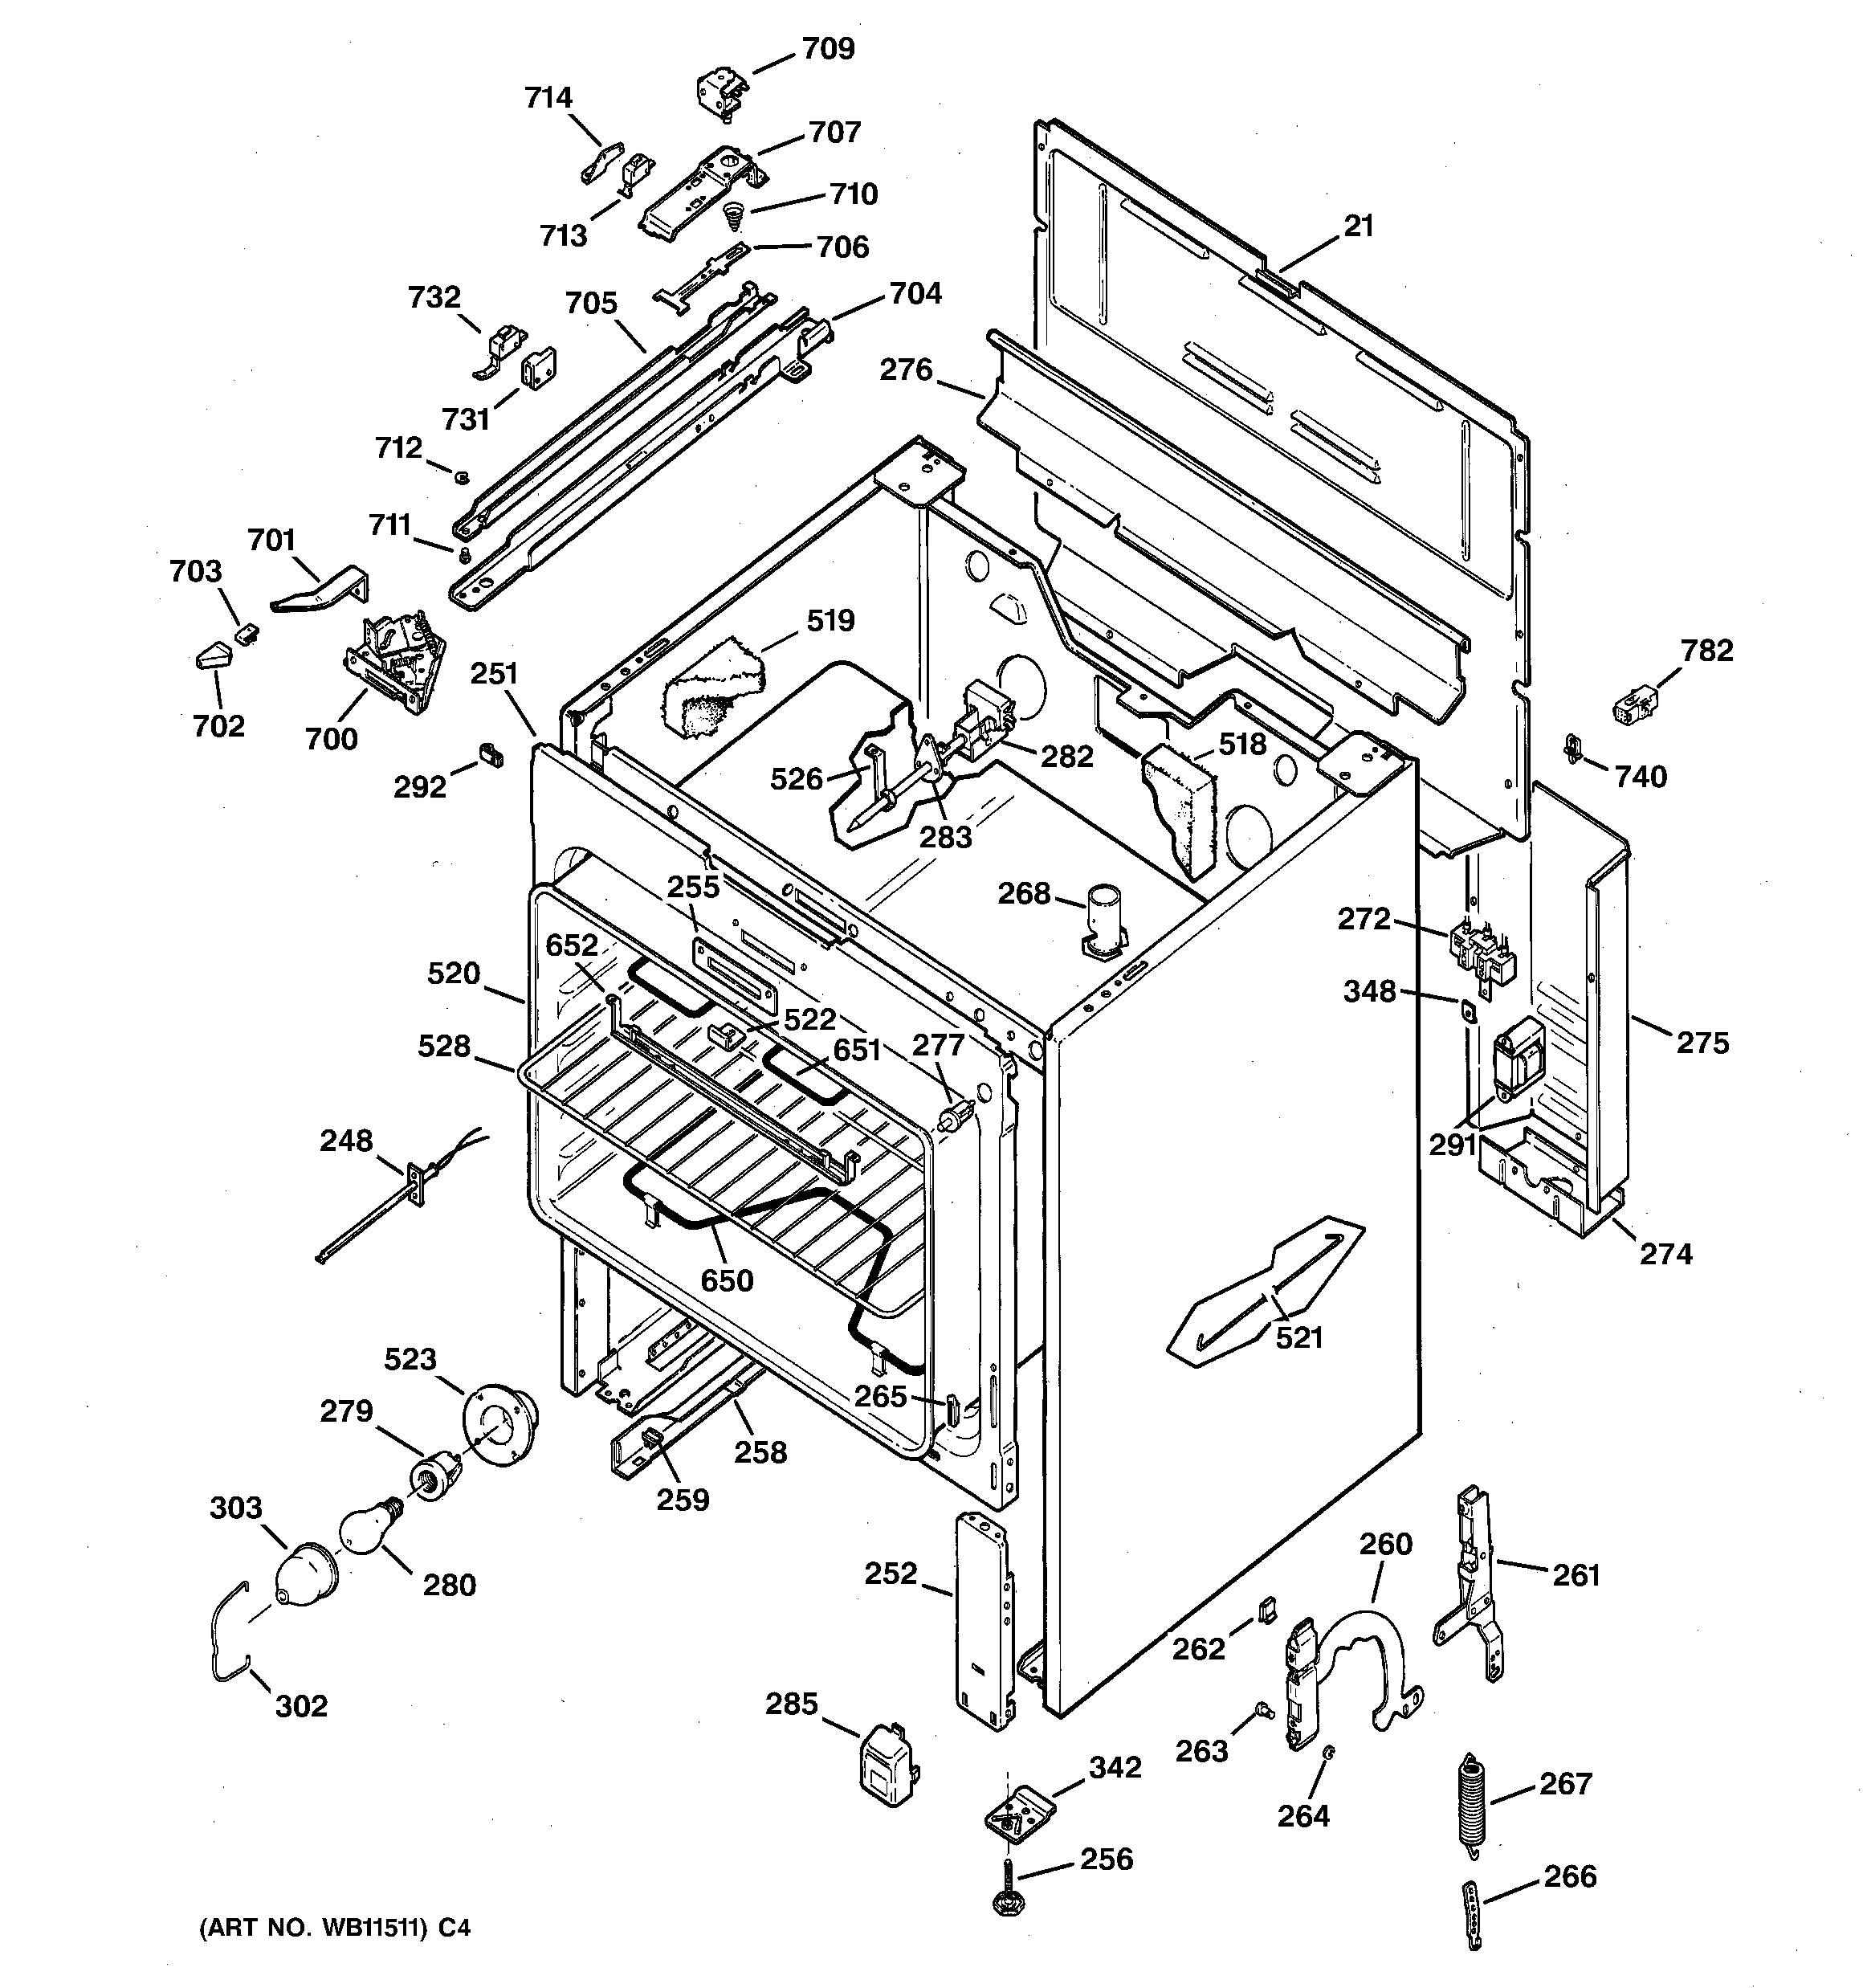 Unique Wiring Diagram Of Electric Desk Fan Diagram